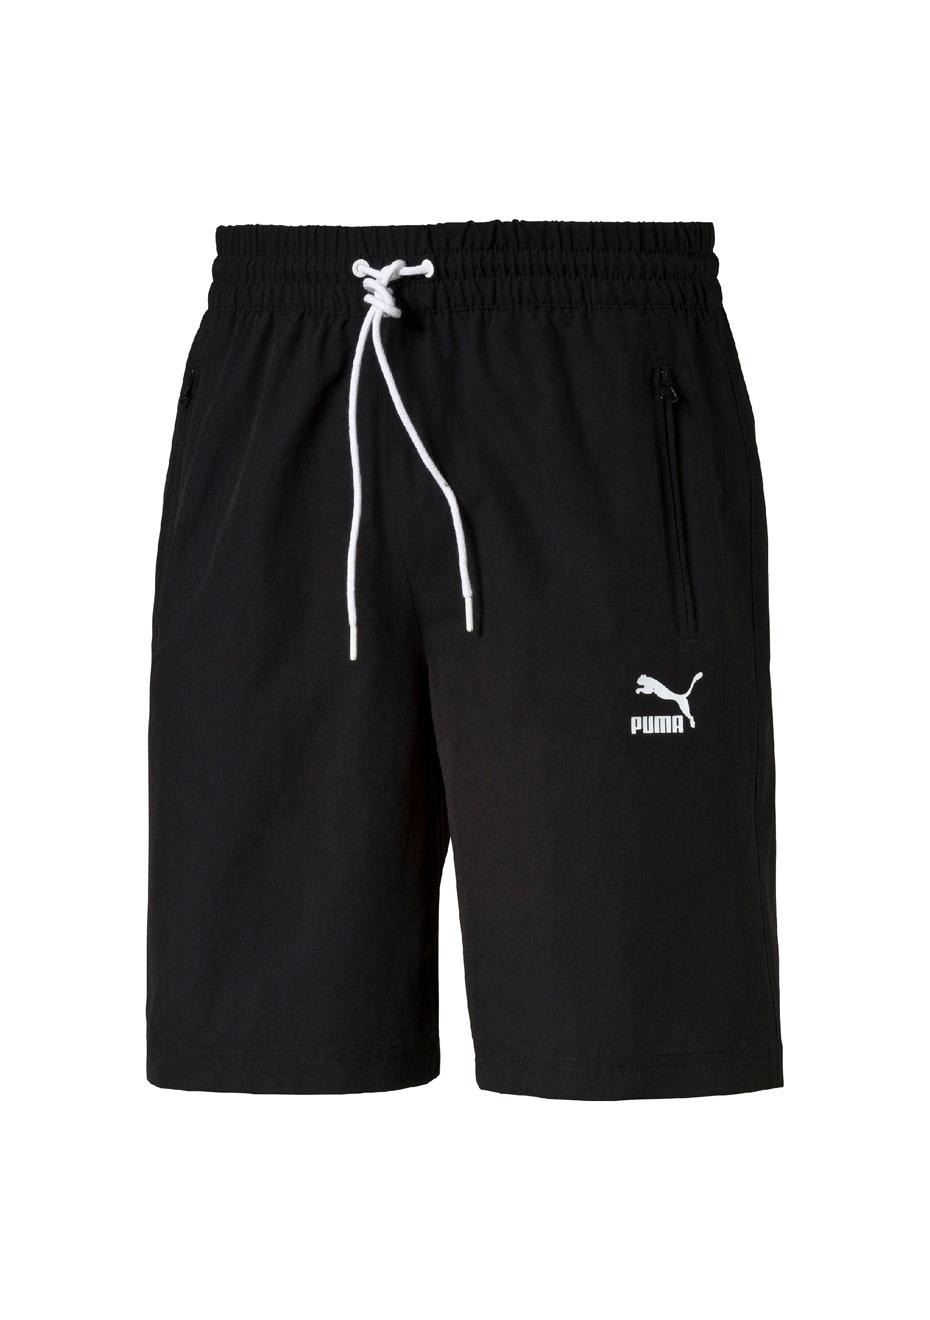 Puma - Woven Shorts - Black